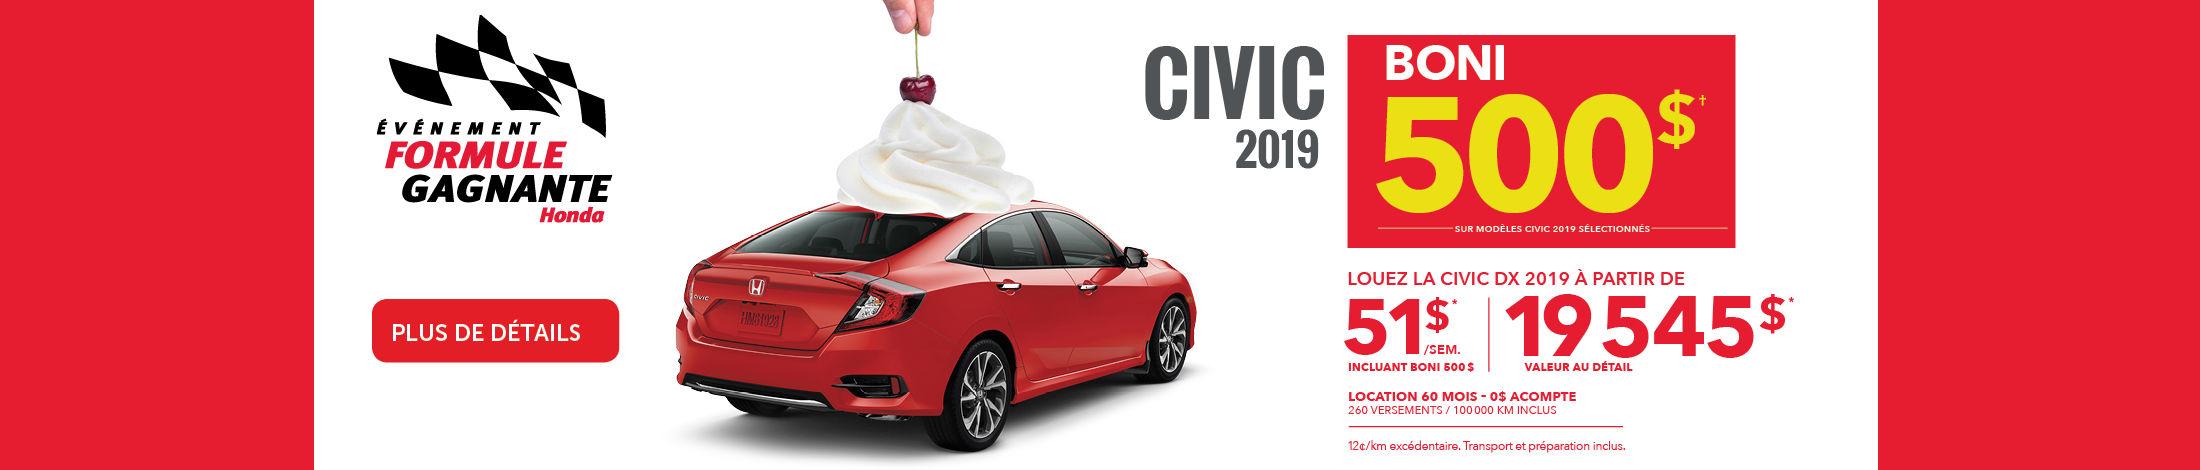 civic juillet 2019